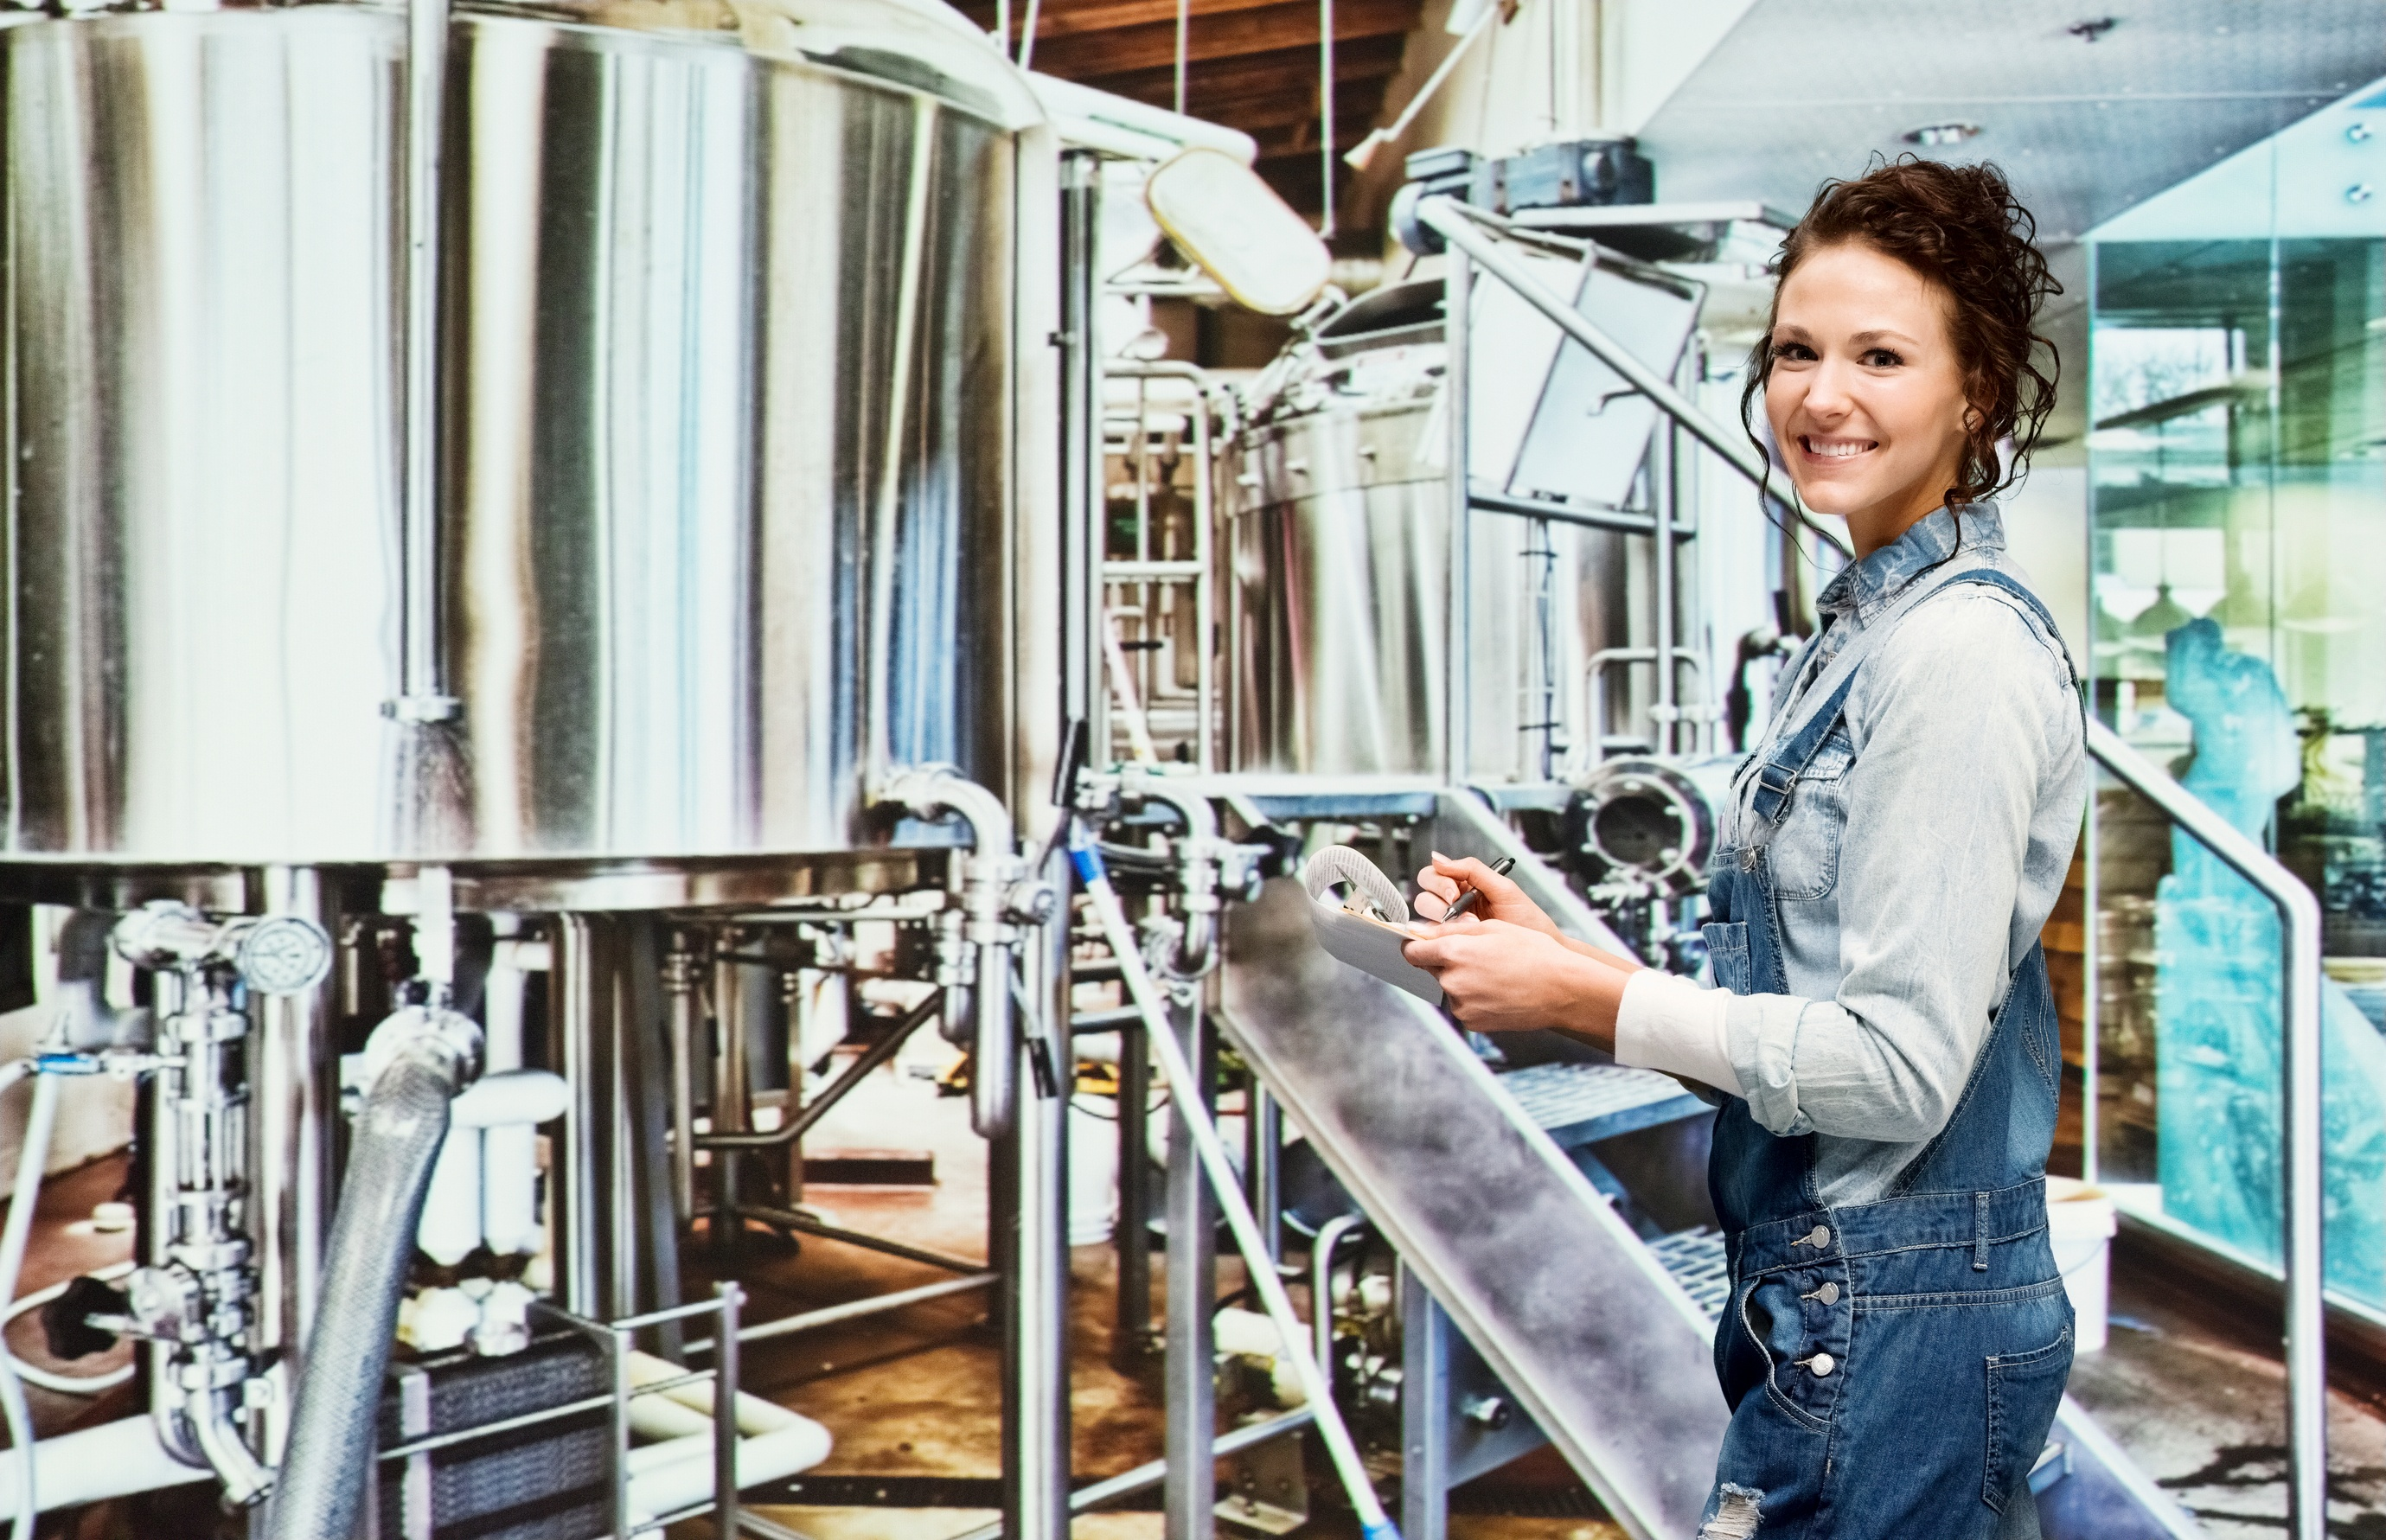 Brewer woman_64067695_LARGE.jpg